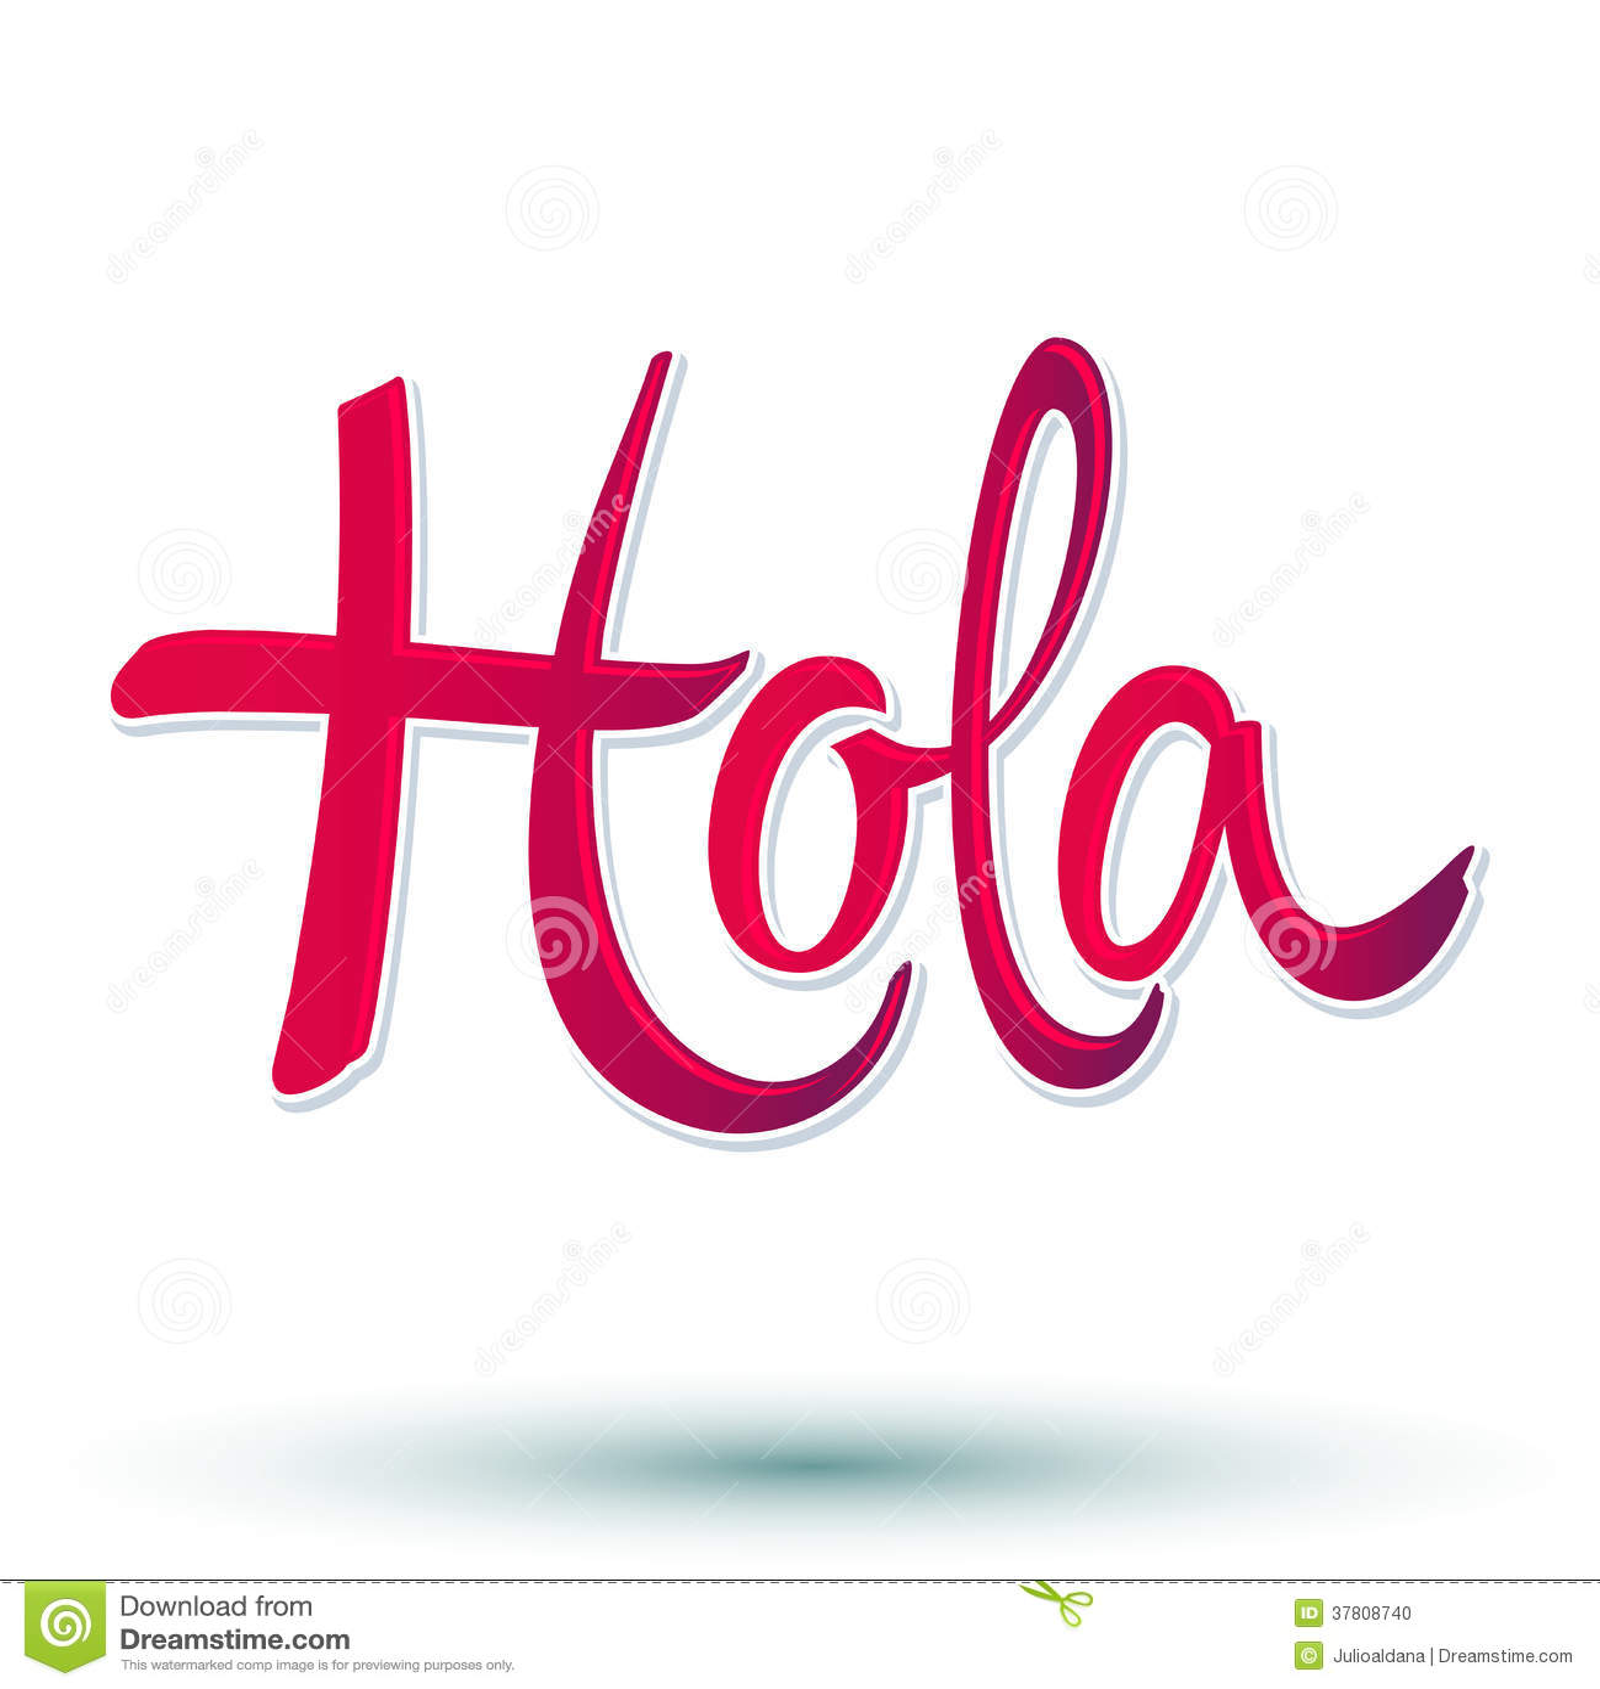 hola essay Contextual translation of hola essay into english human translations with examples: hi, hola, holah, hello, ajalas, hi there, home boy, traduceme, puto :,v.